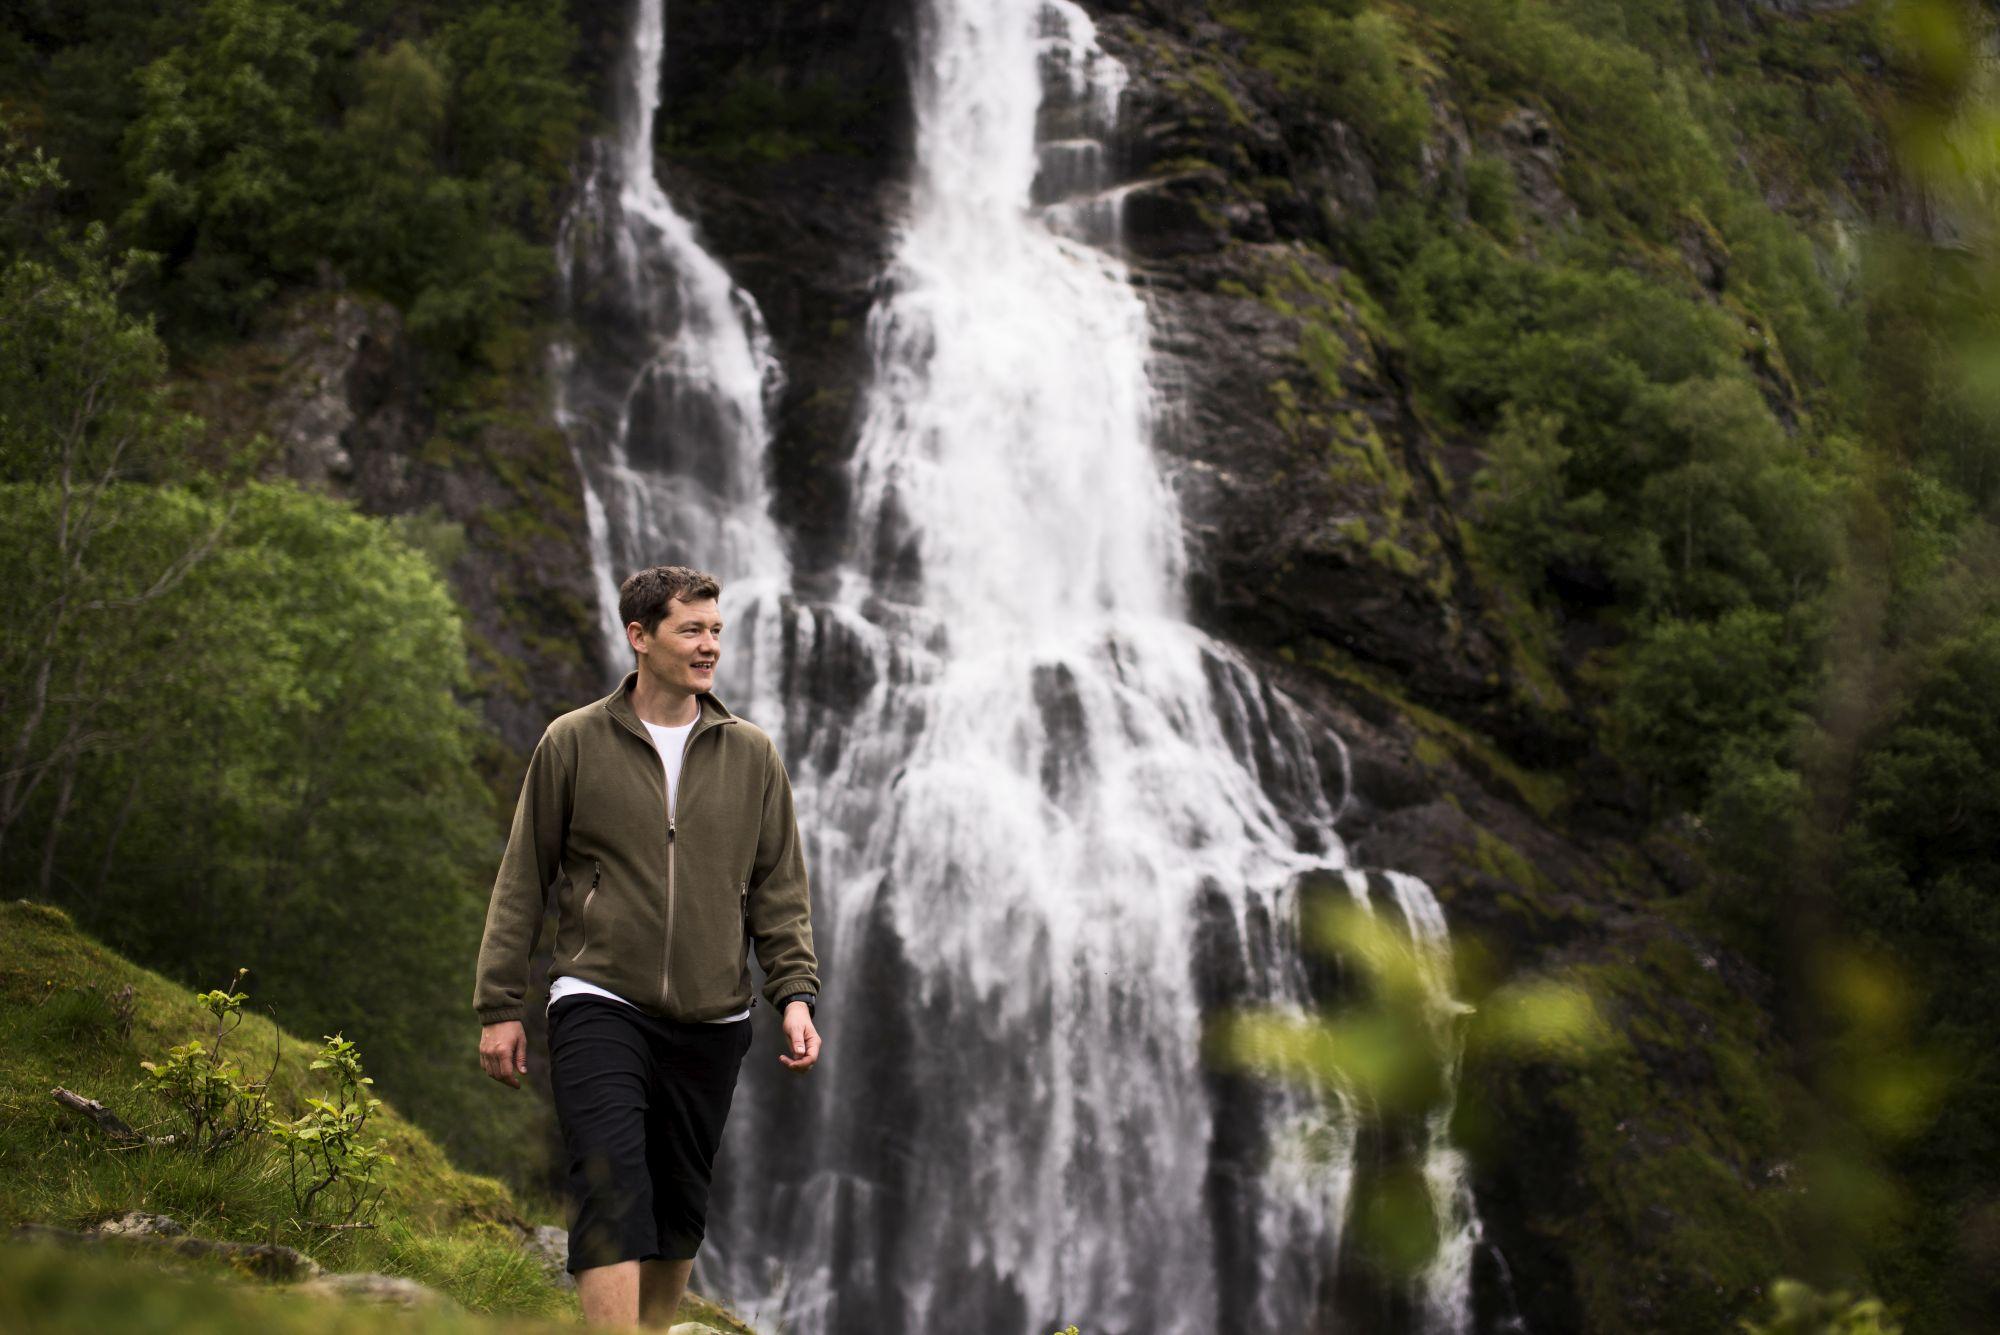 Guided hiking trip to Brekkefossen waterfall in Flåm, Norway